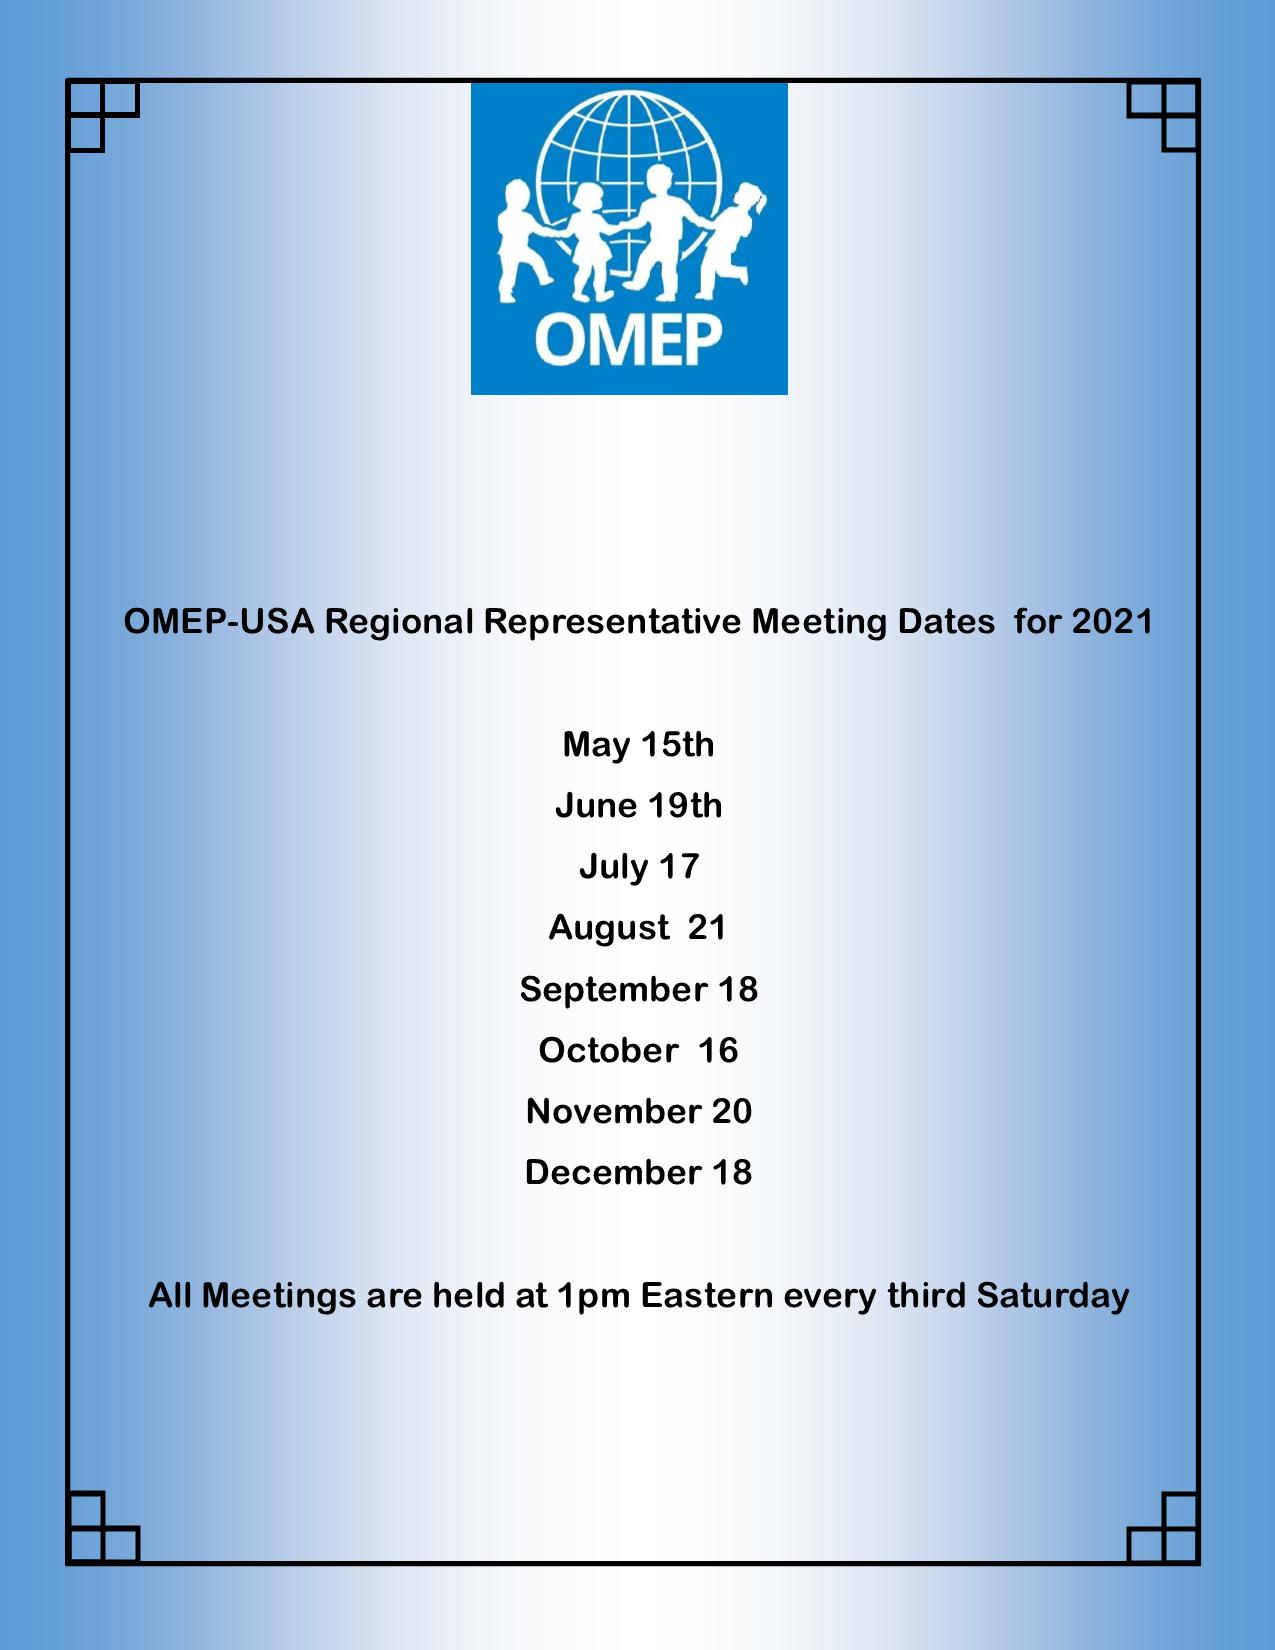 Meeting Dates for Regional Representatives